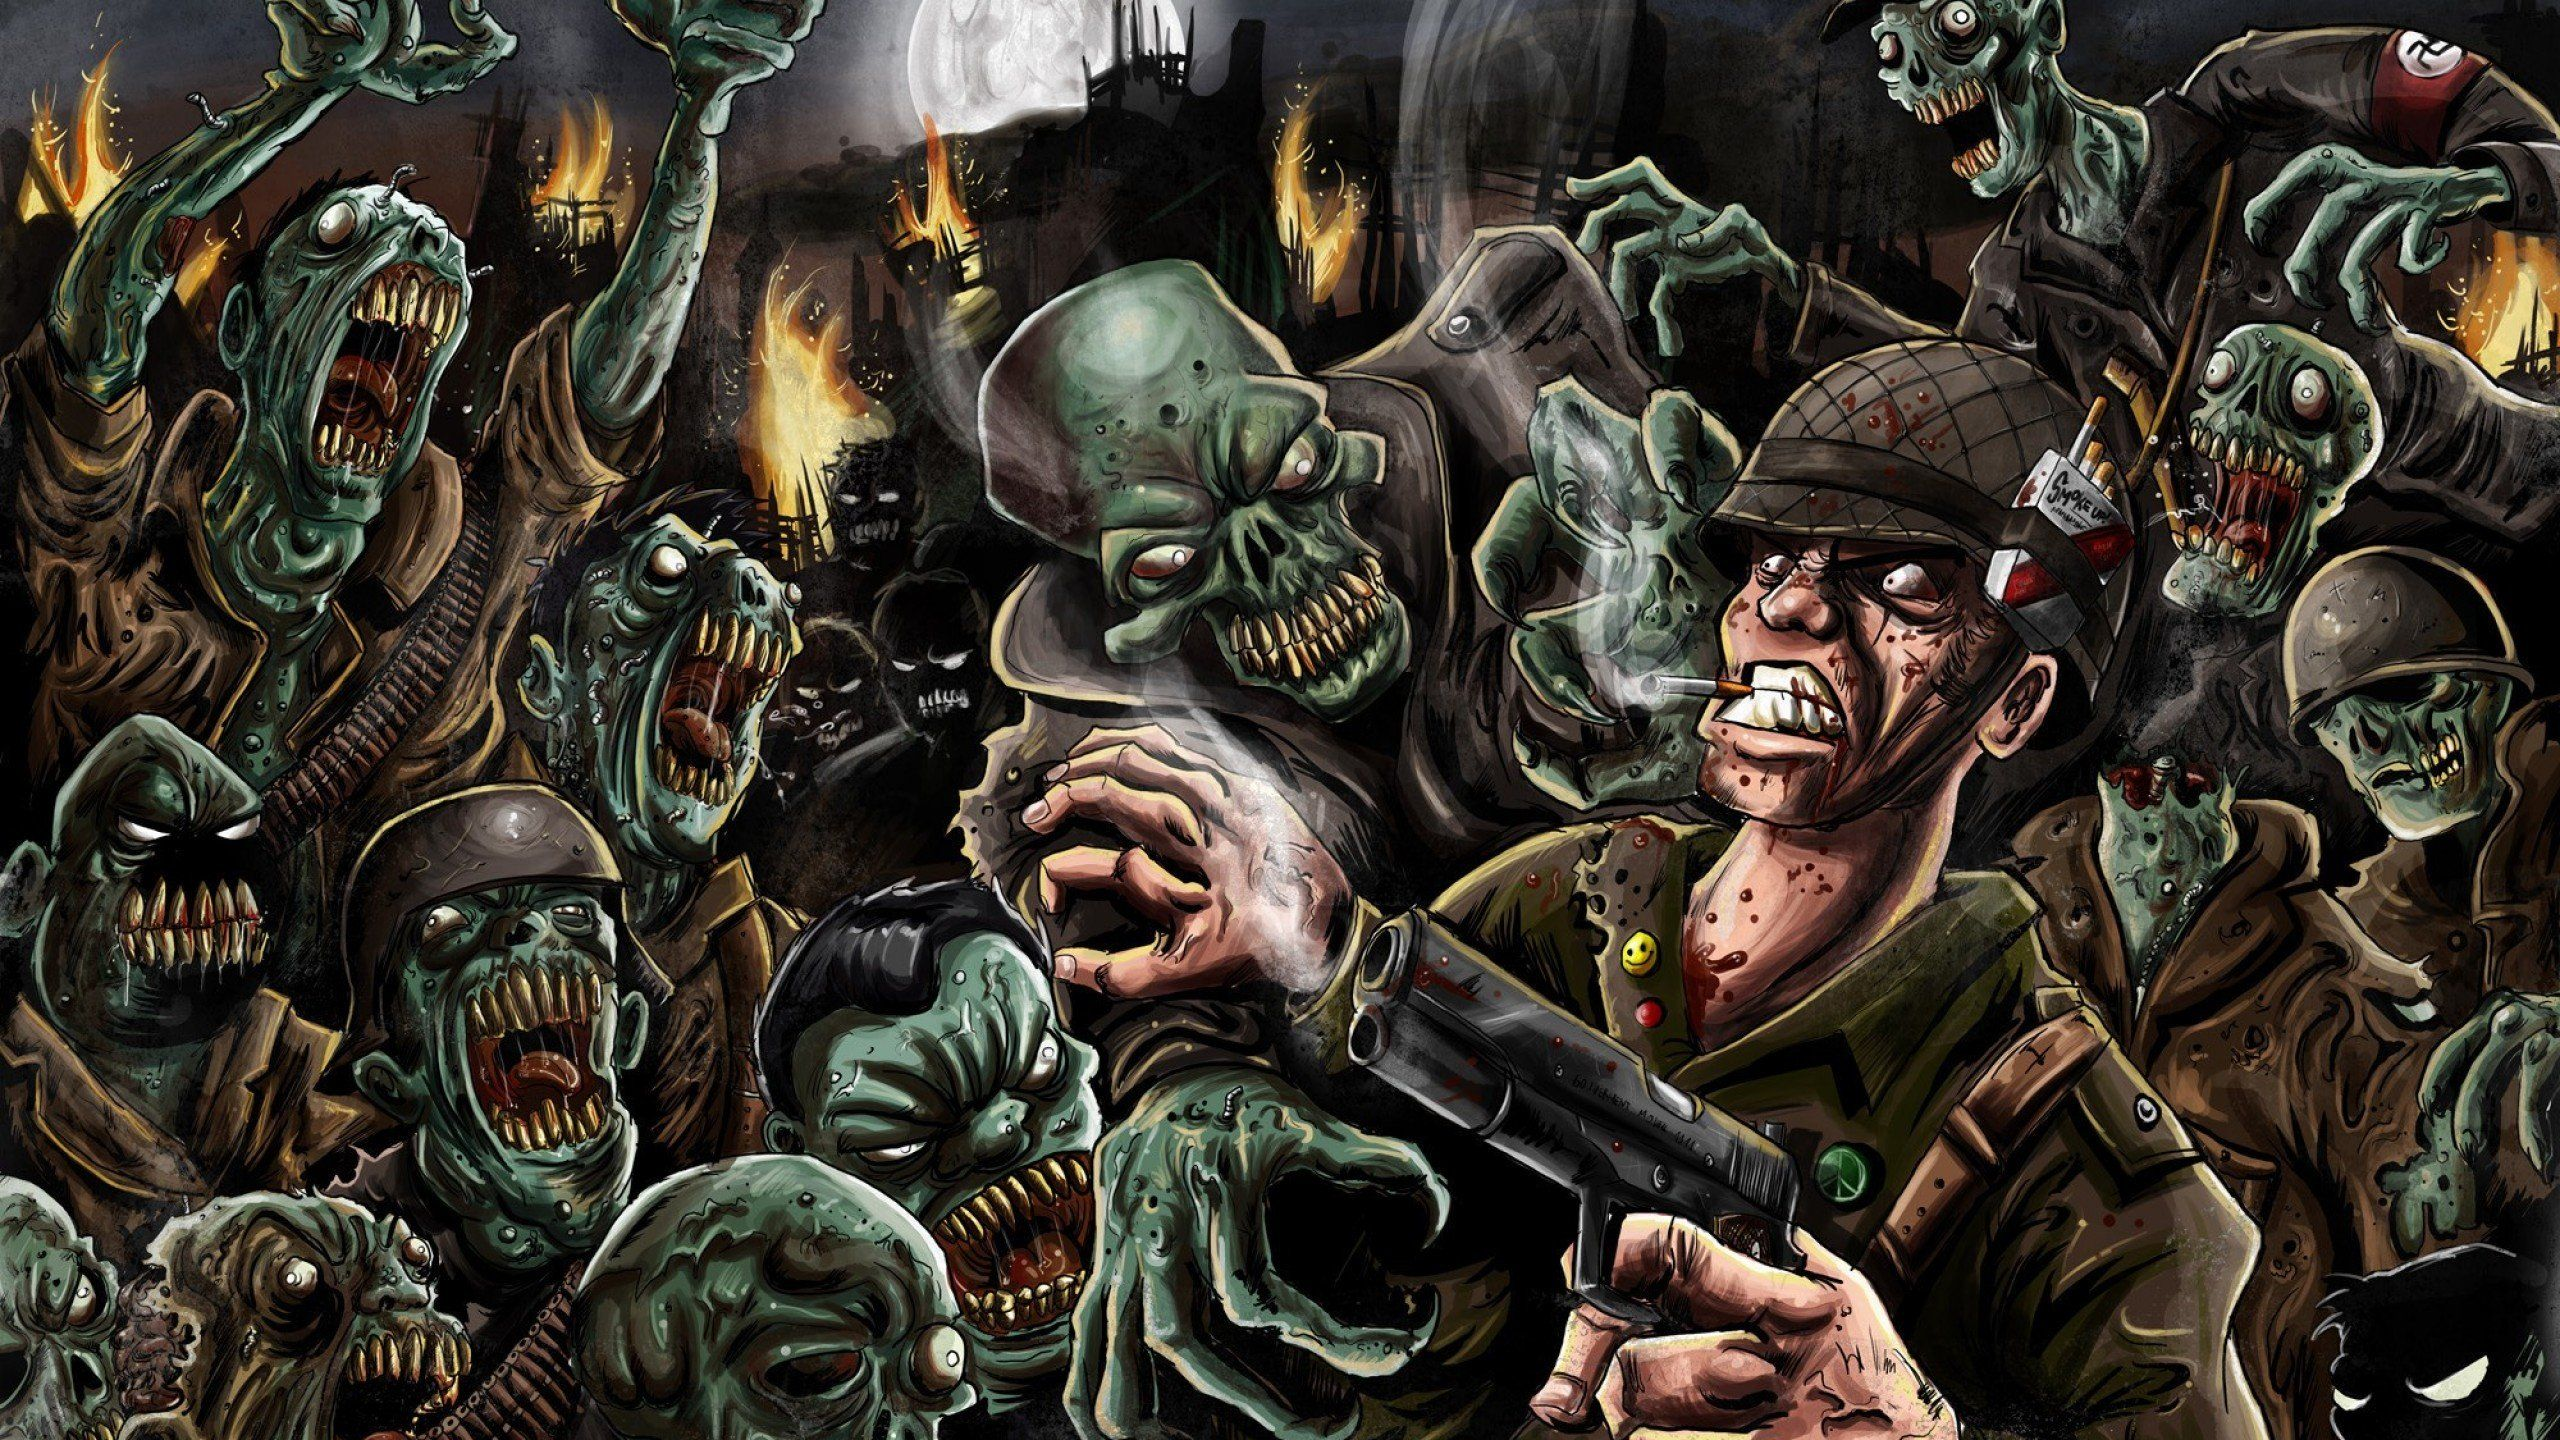 Cod zombie wallpaper